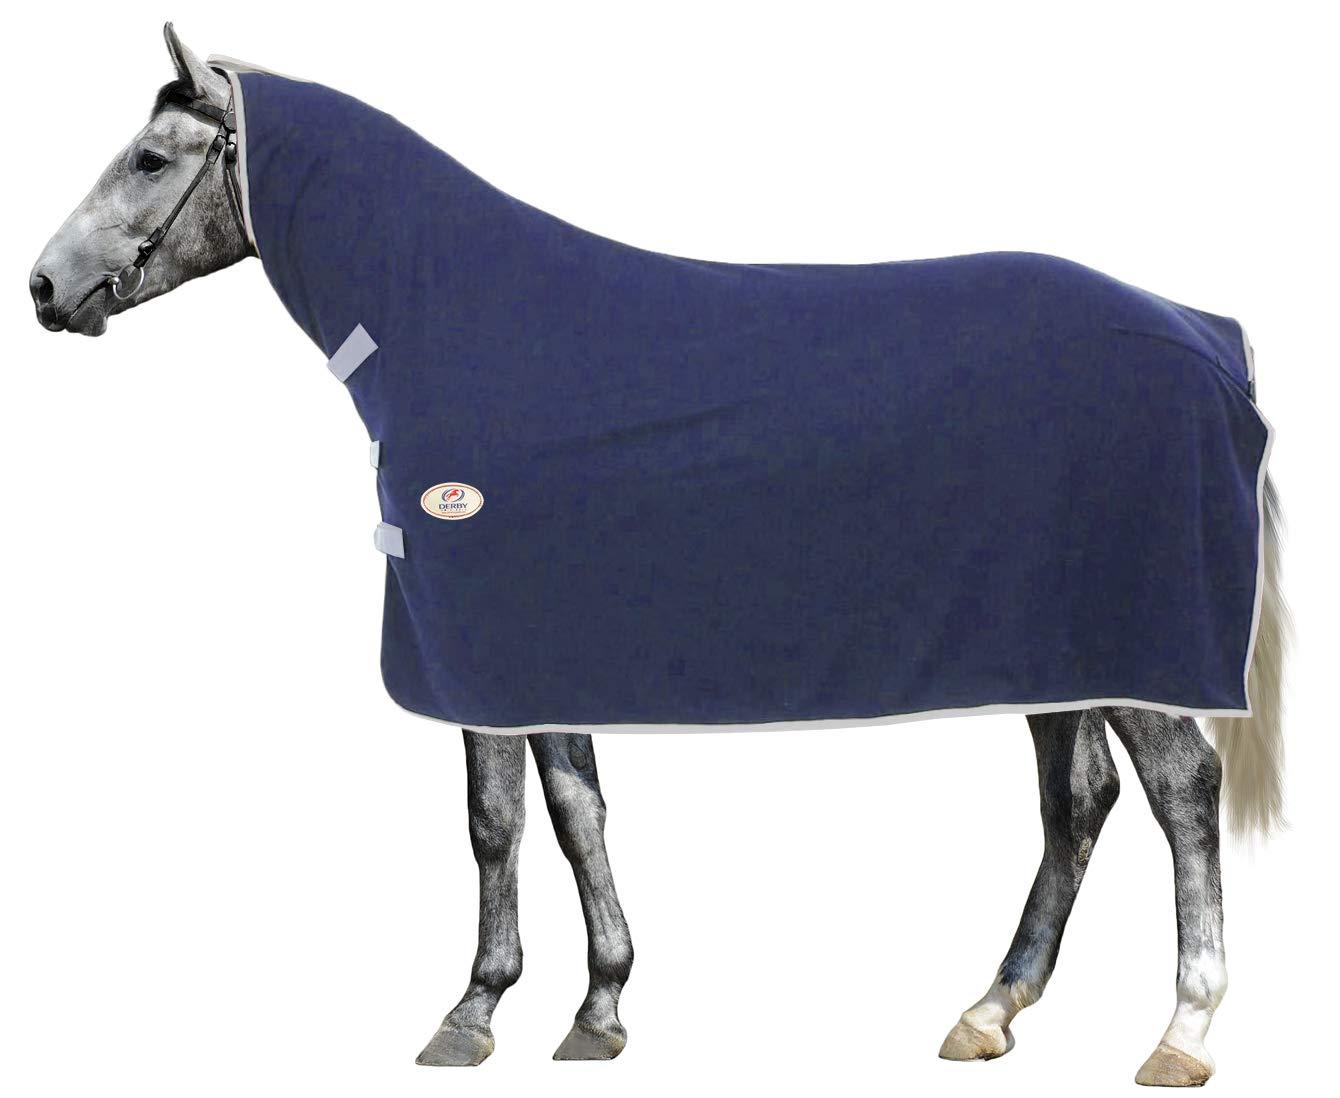 Navy Medium Navy Medium Derby Originals Horse Fleece Cooler with Neck Cover